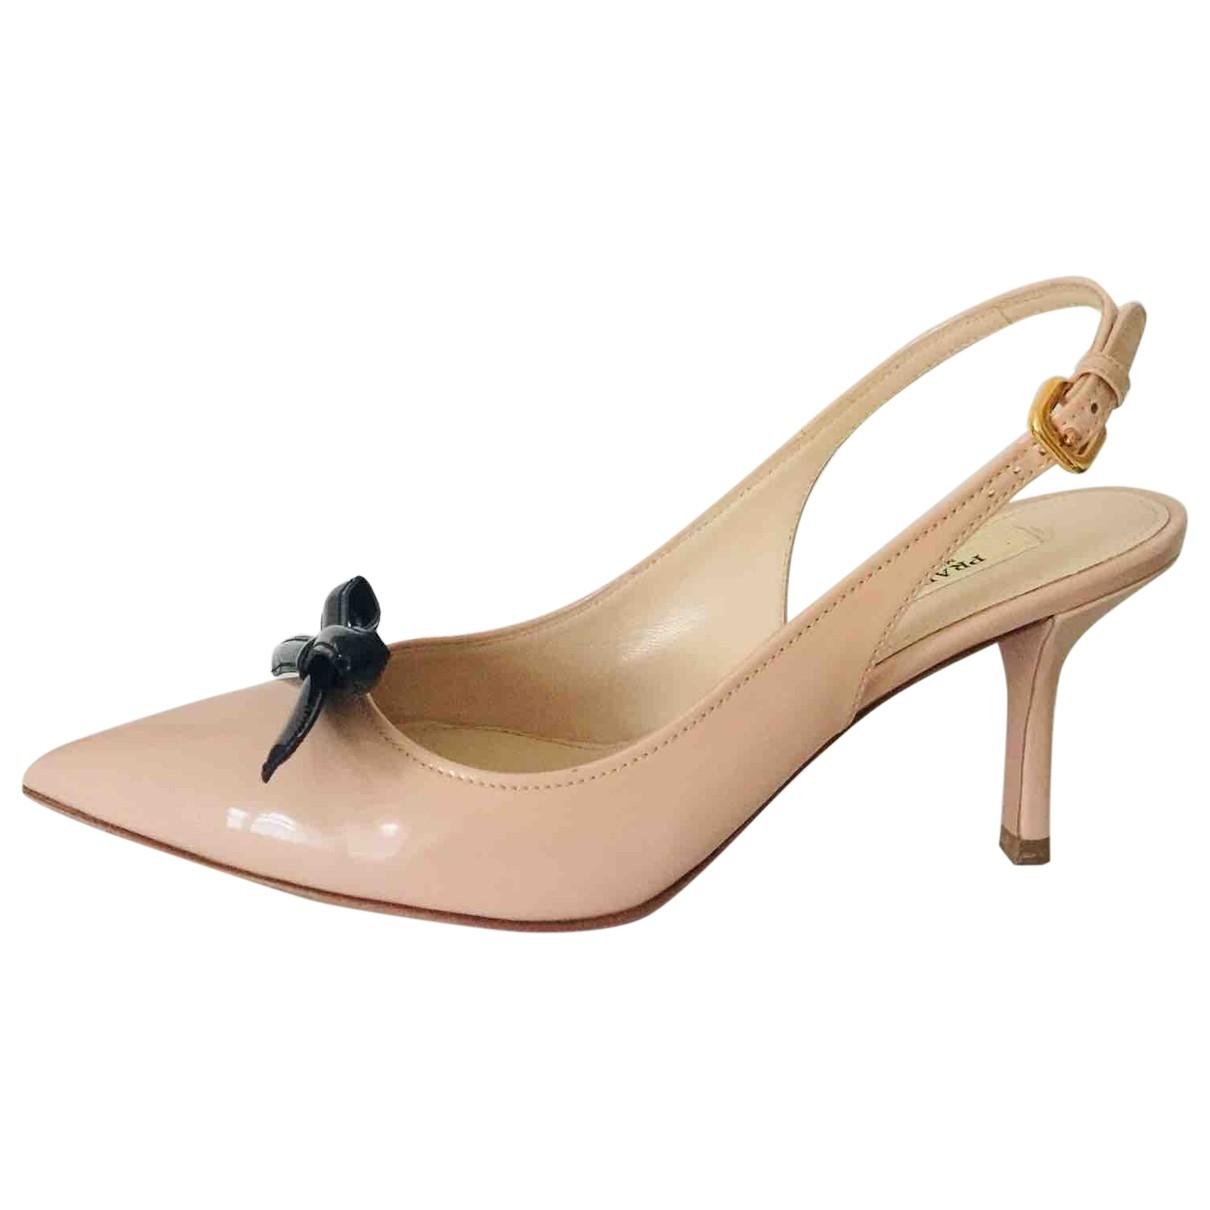 Prada \N Beige Leather Heels for Women 36.5 EU